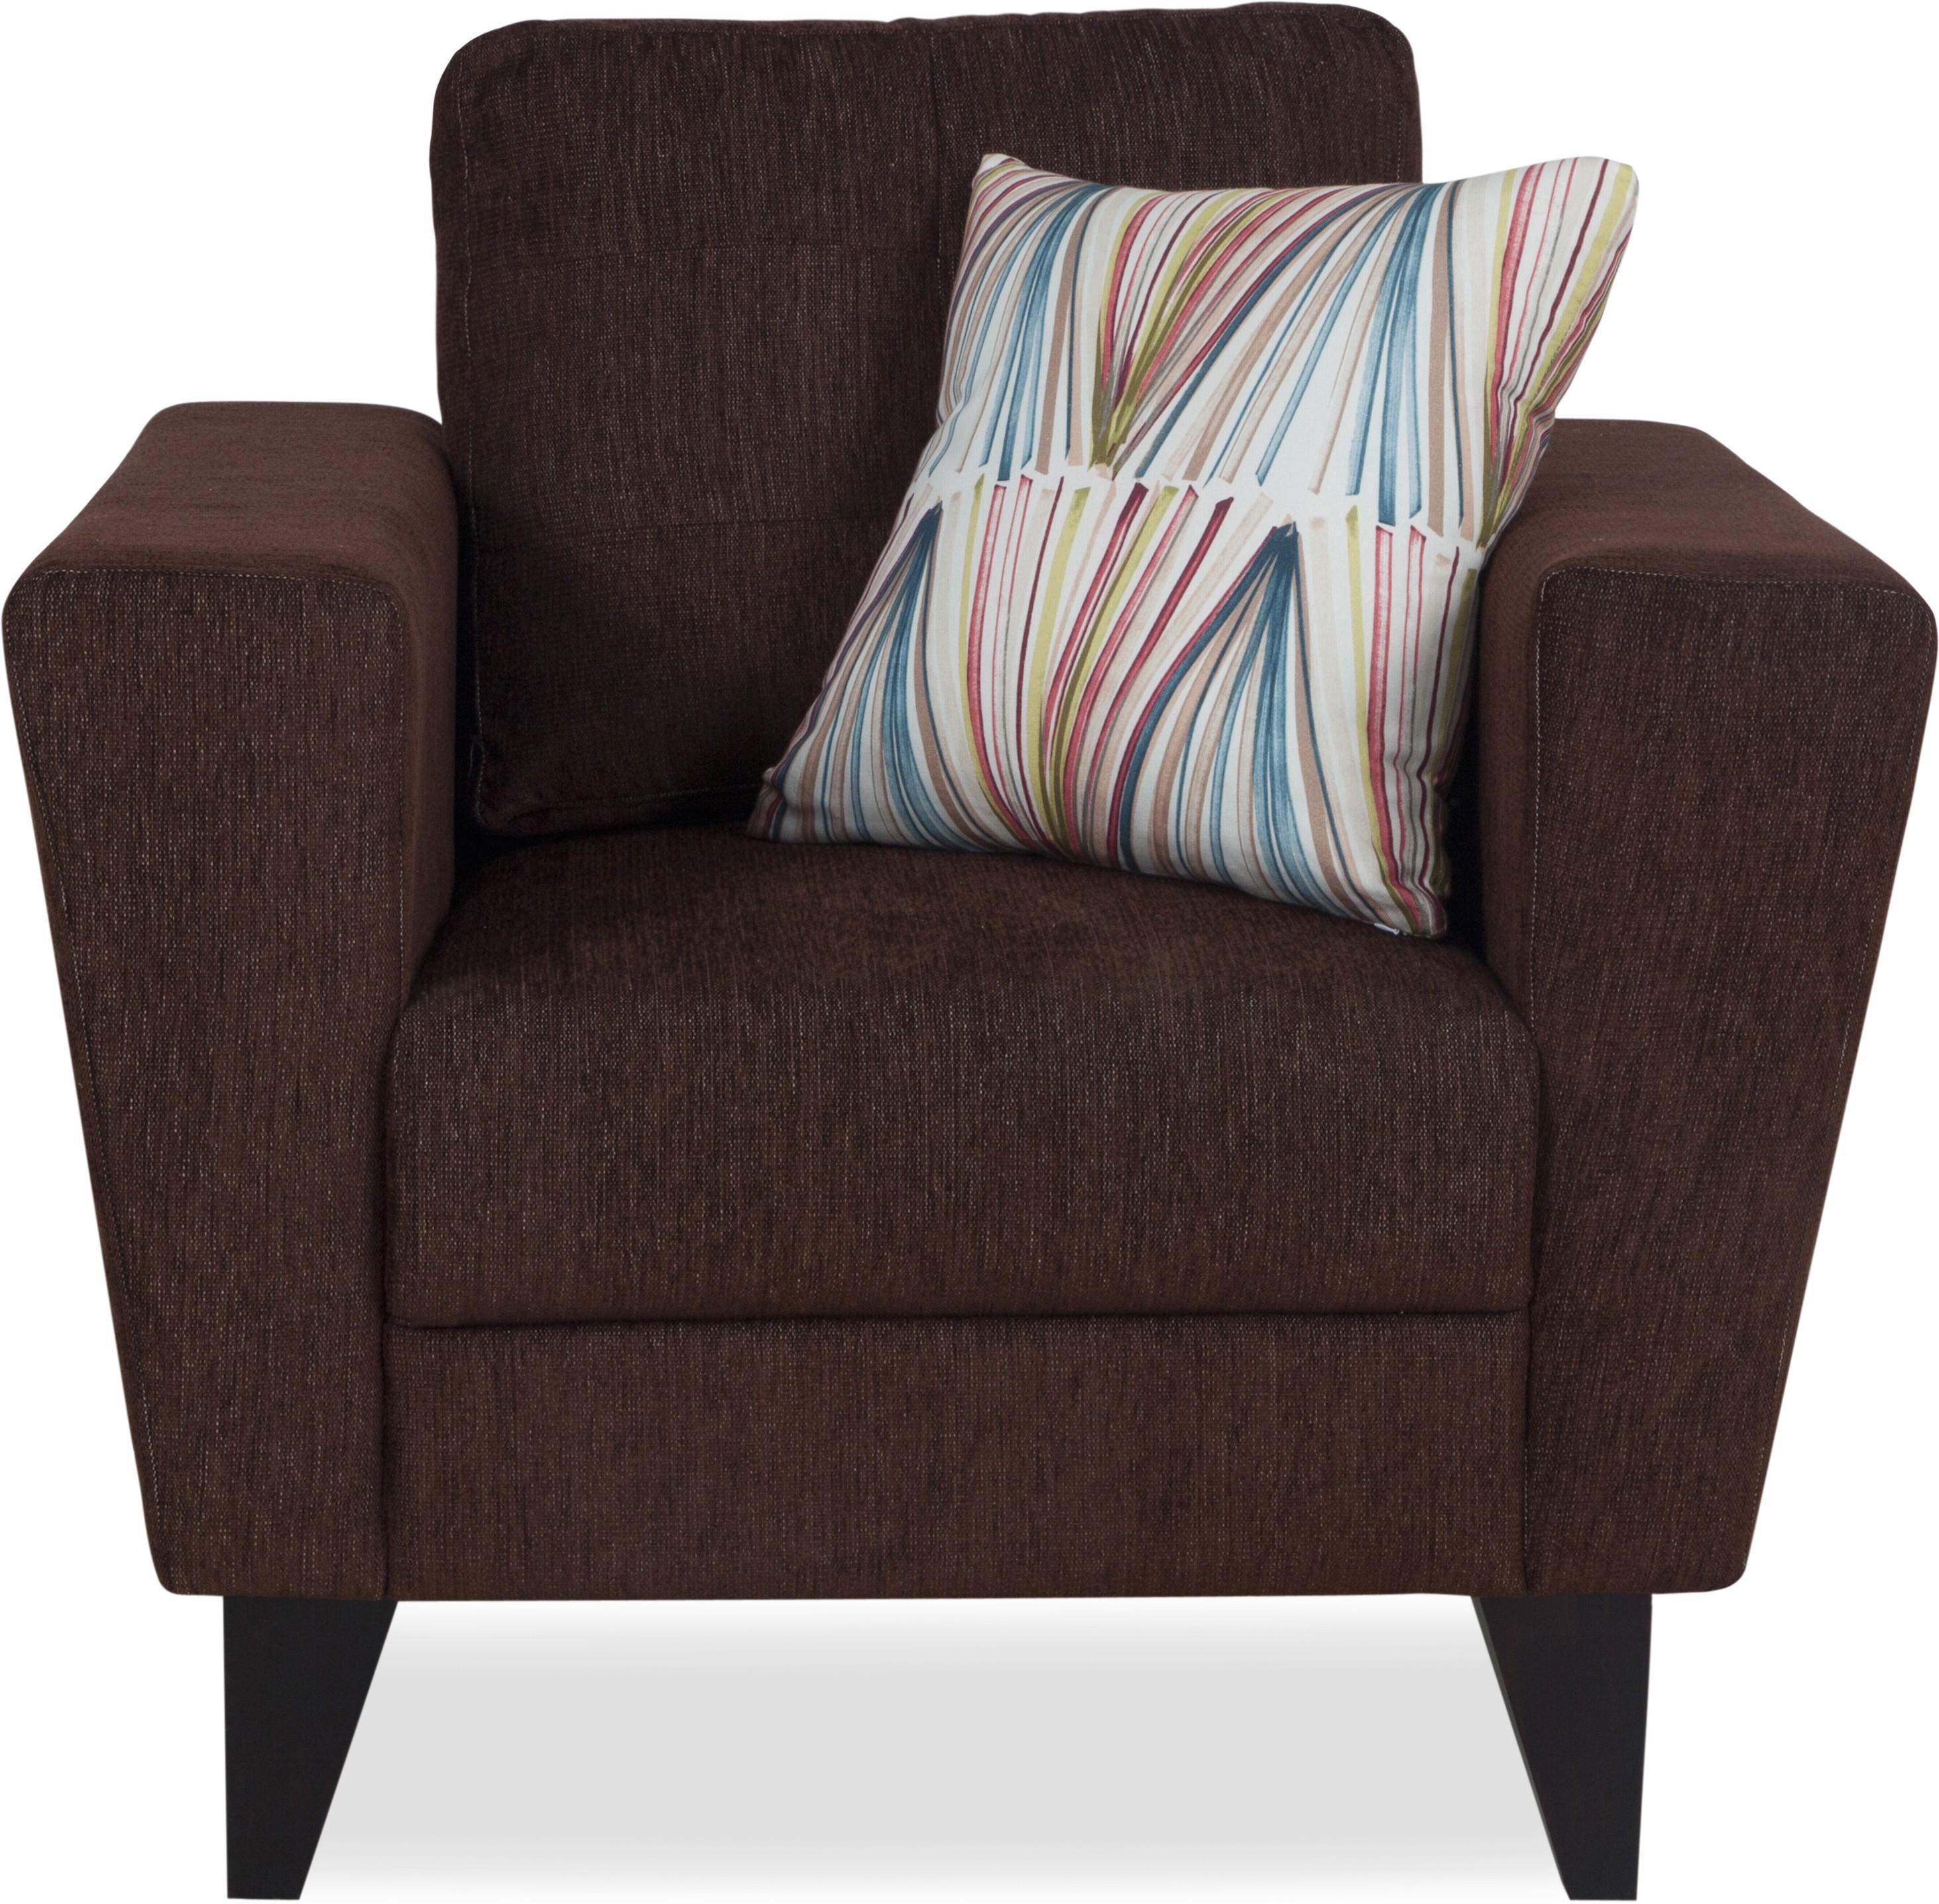 Urban Living Bristol Fabric 1 Seater Sofa